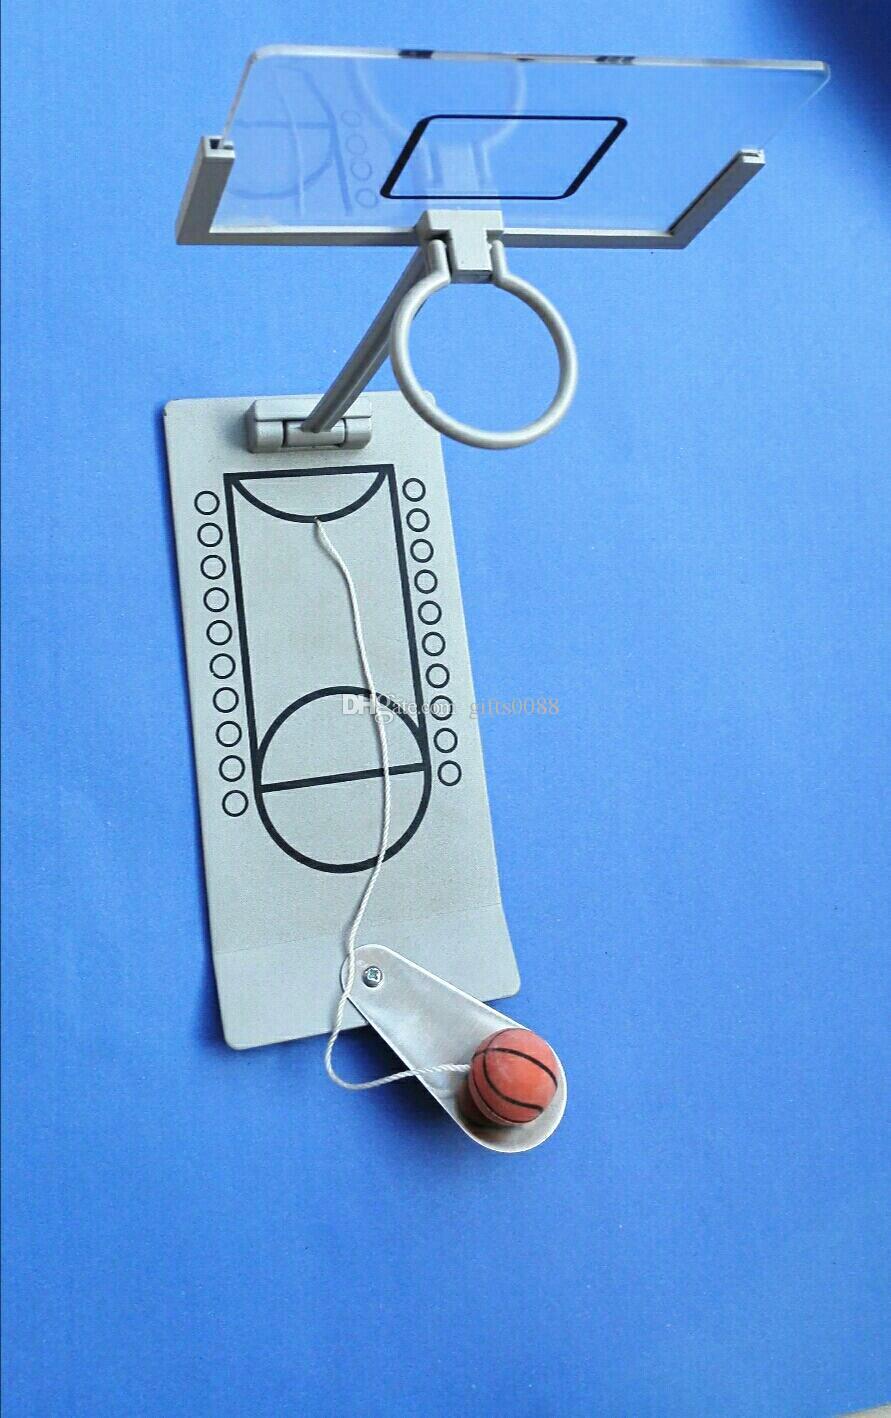 Mini Finger Basketball Game Foldable Table Spring Loaded Desktop Family Fun Toy Sport